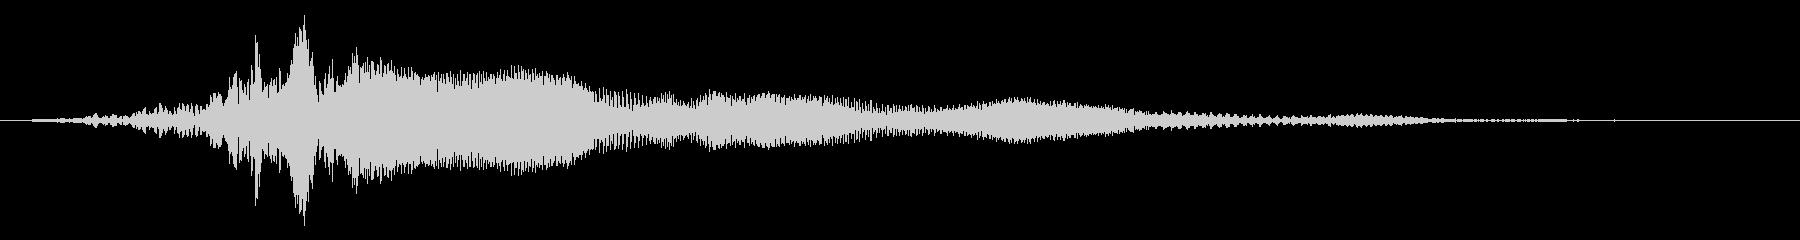 SMOOTH SPRINGY BO...の未再生の波形